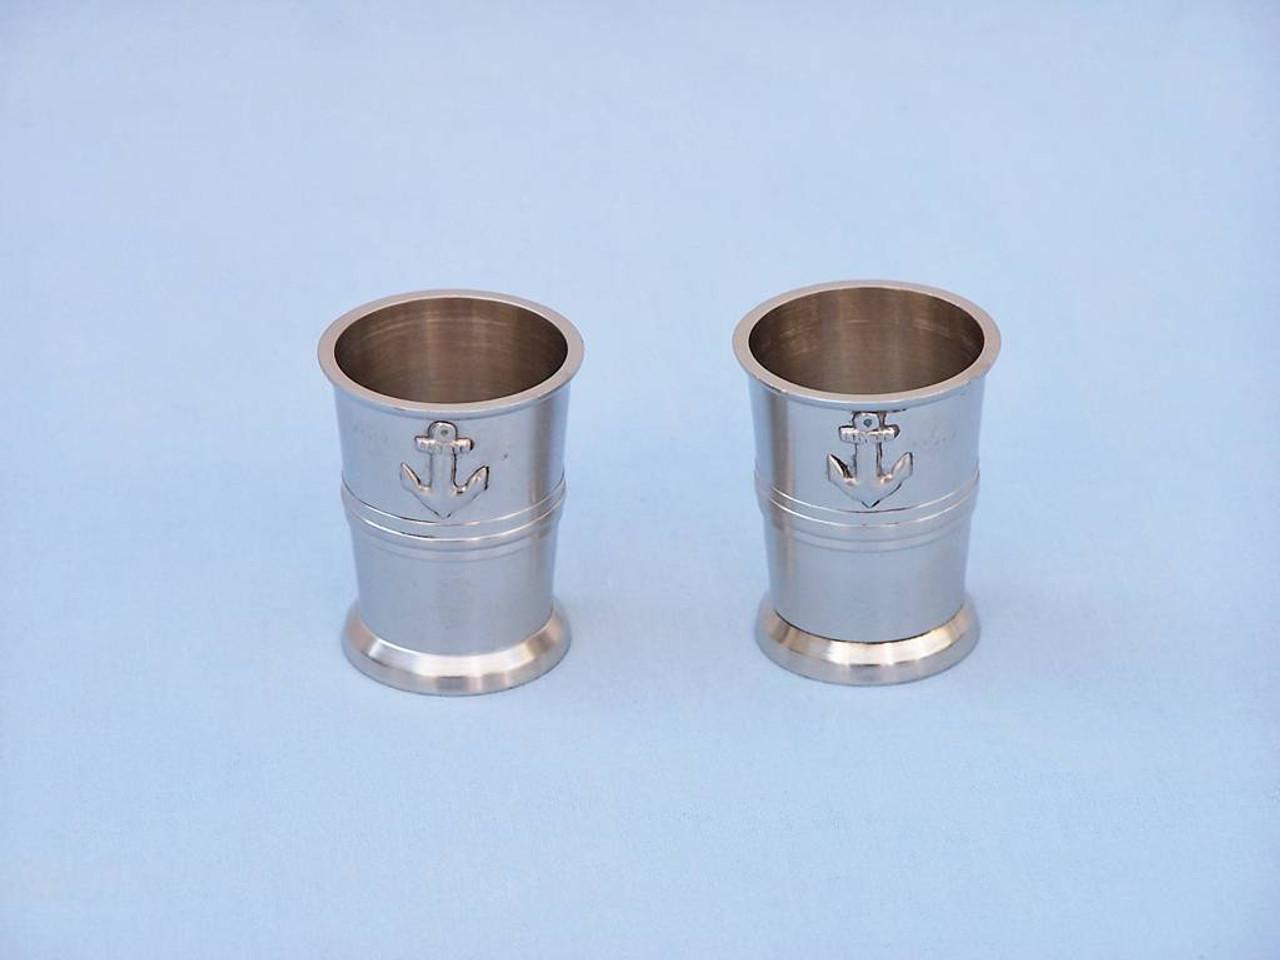 Anchor Shot Glasses Brushed Nickel Set of 2 Rosewood Case